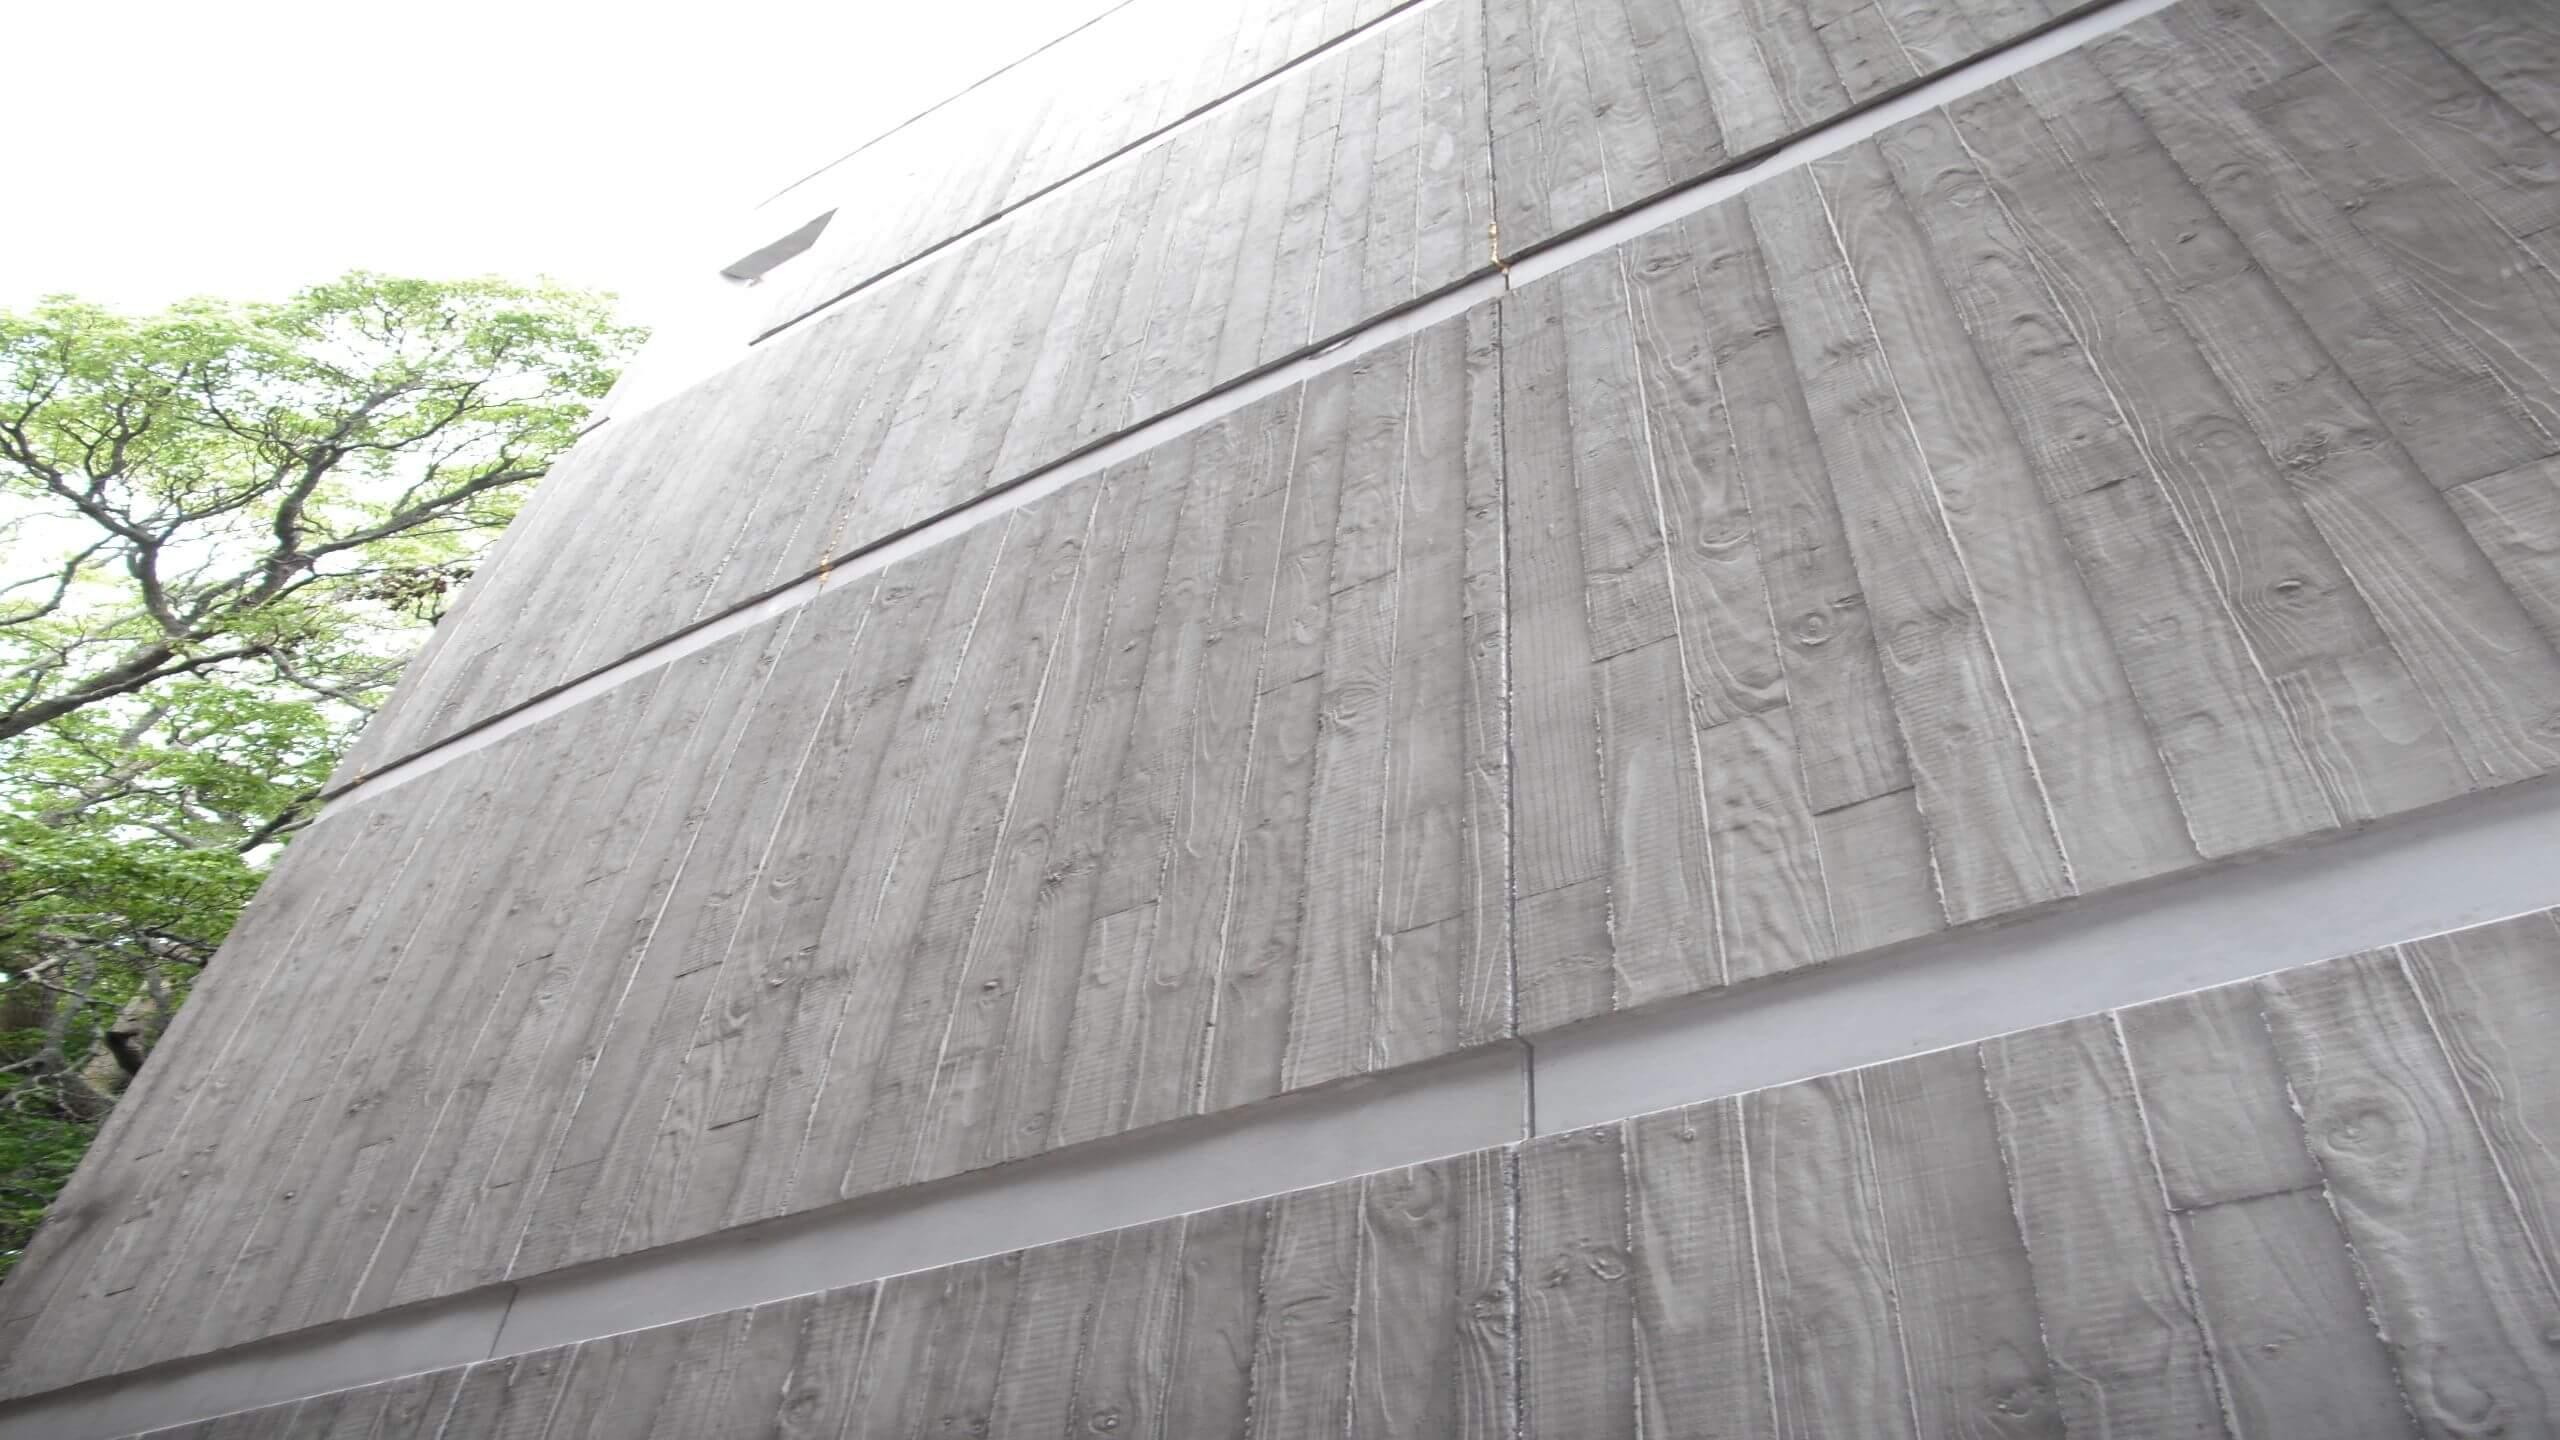 litecrete-precast-concrete-vertical-rough-sawn-timber-look-1